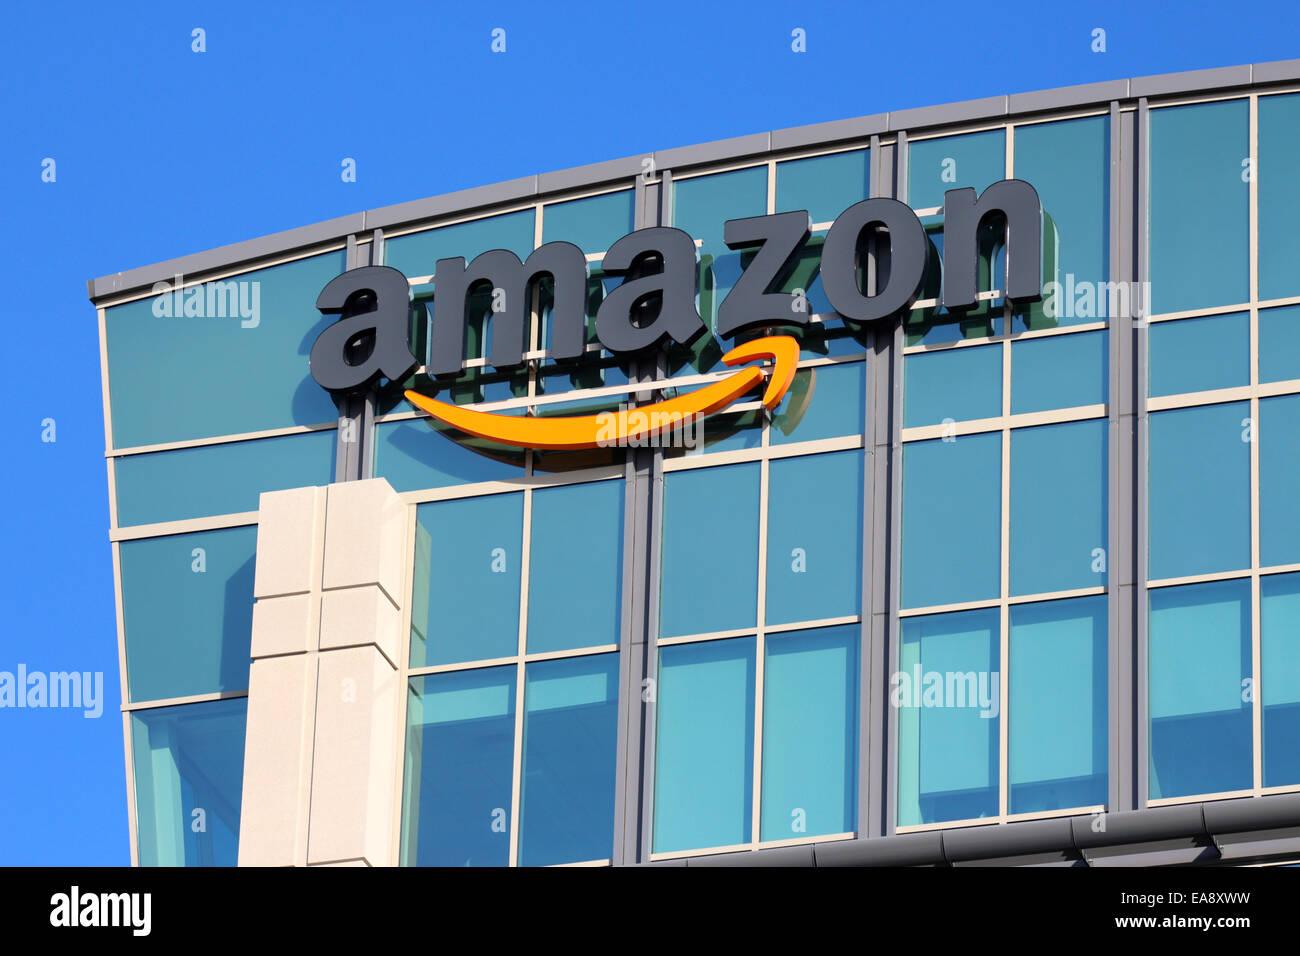 Amazon Corporate Office Building in Sunnyvale, California USA - Stock Image